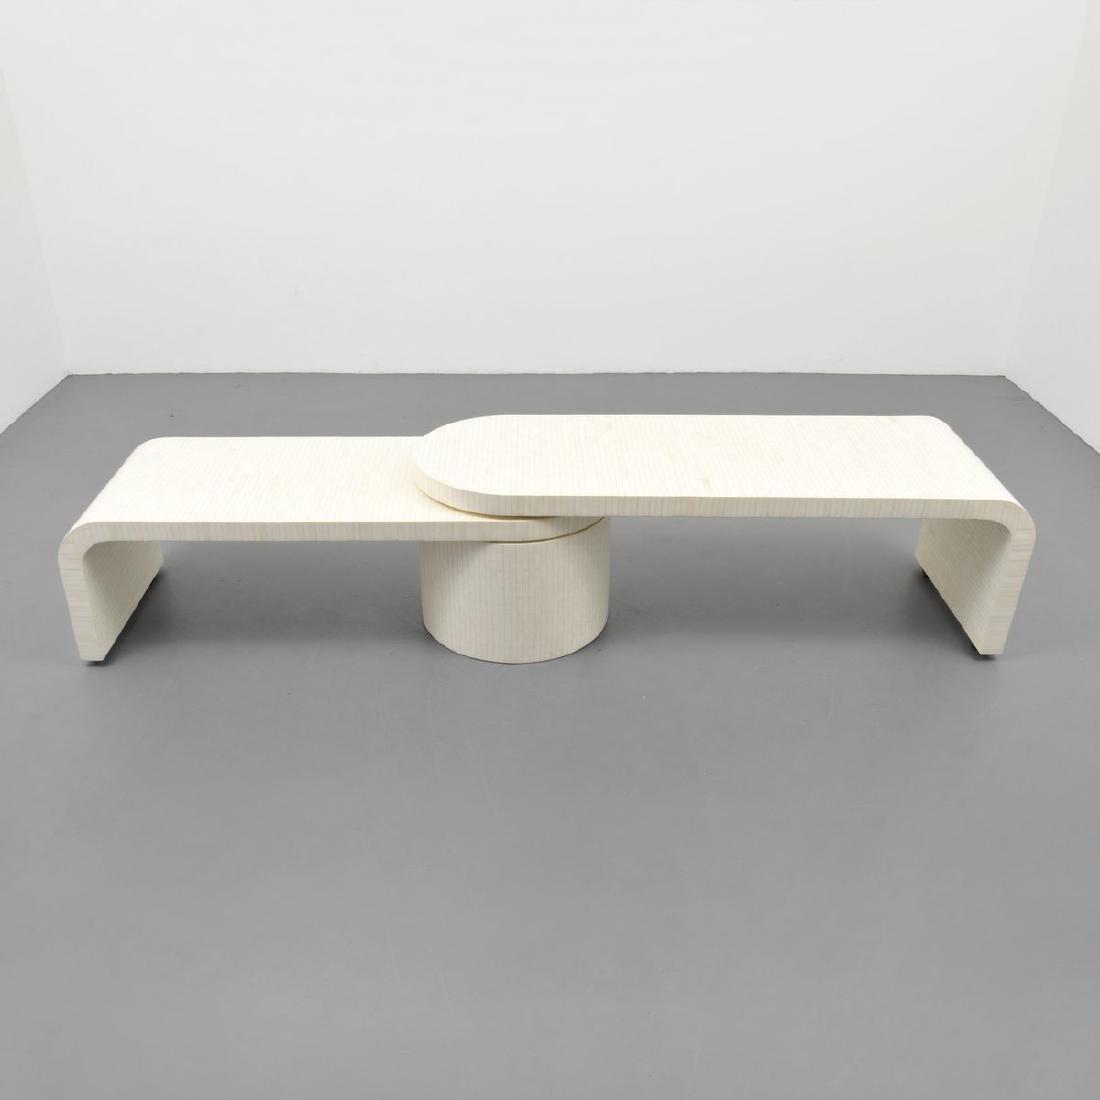 Tessellated Bone Coffee Table, Manner of Karl Springer - 8